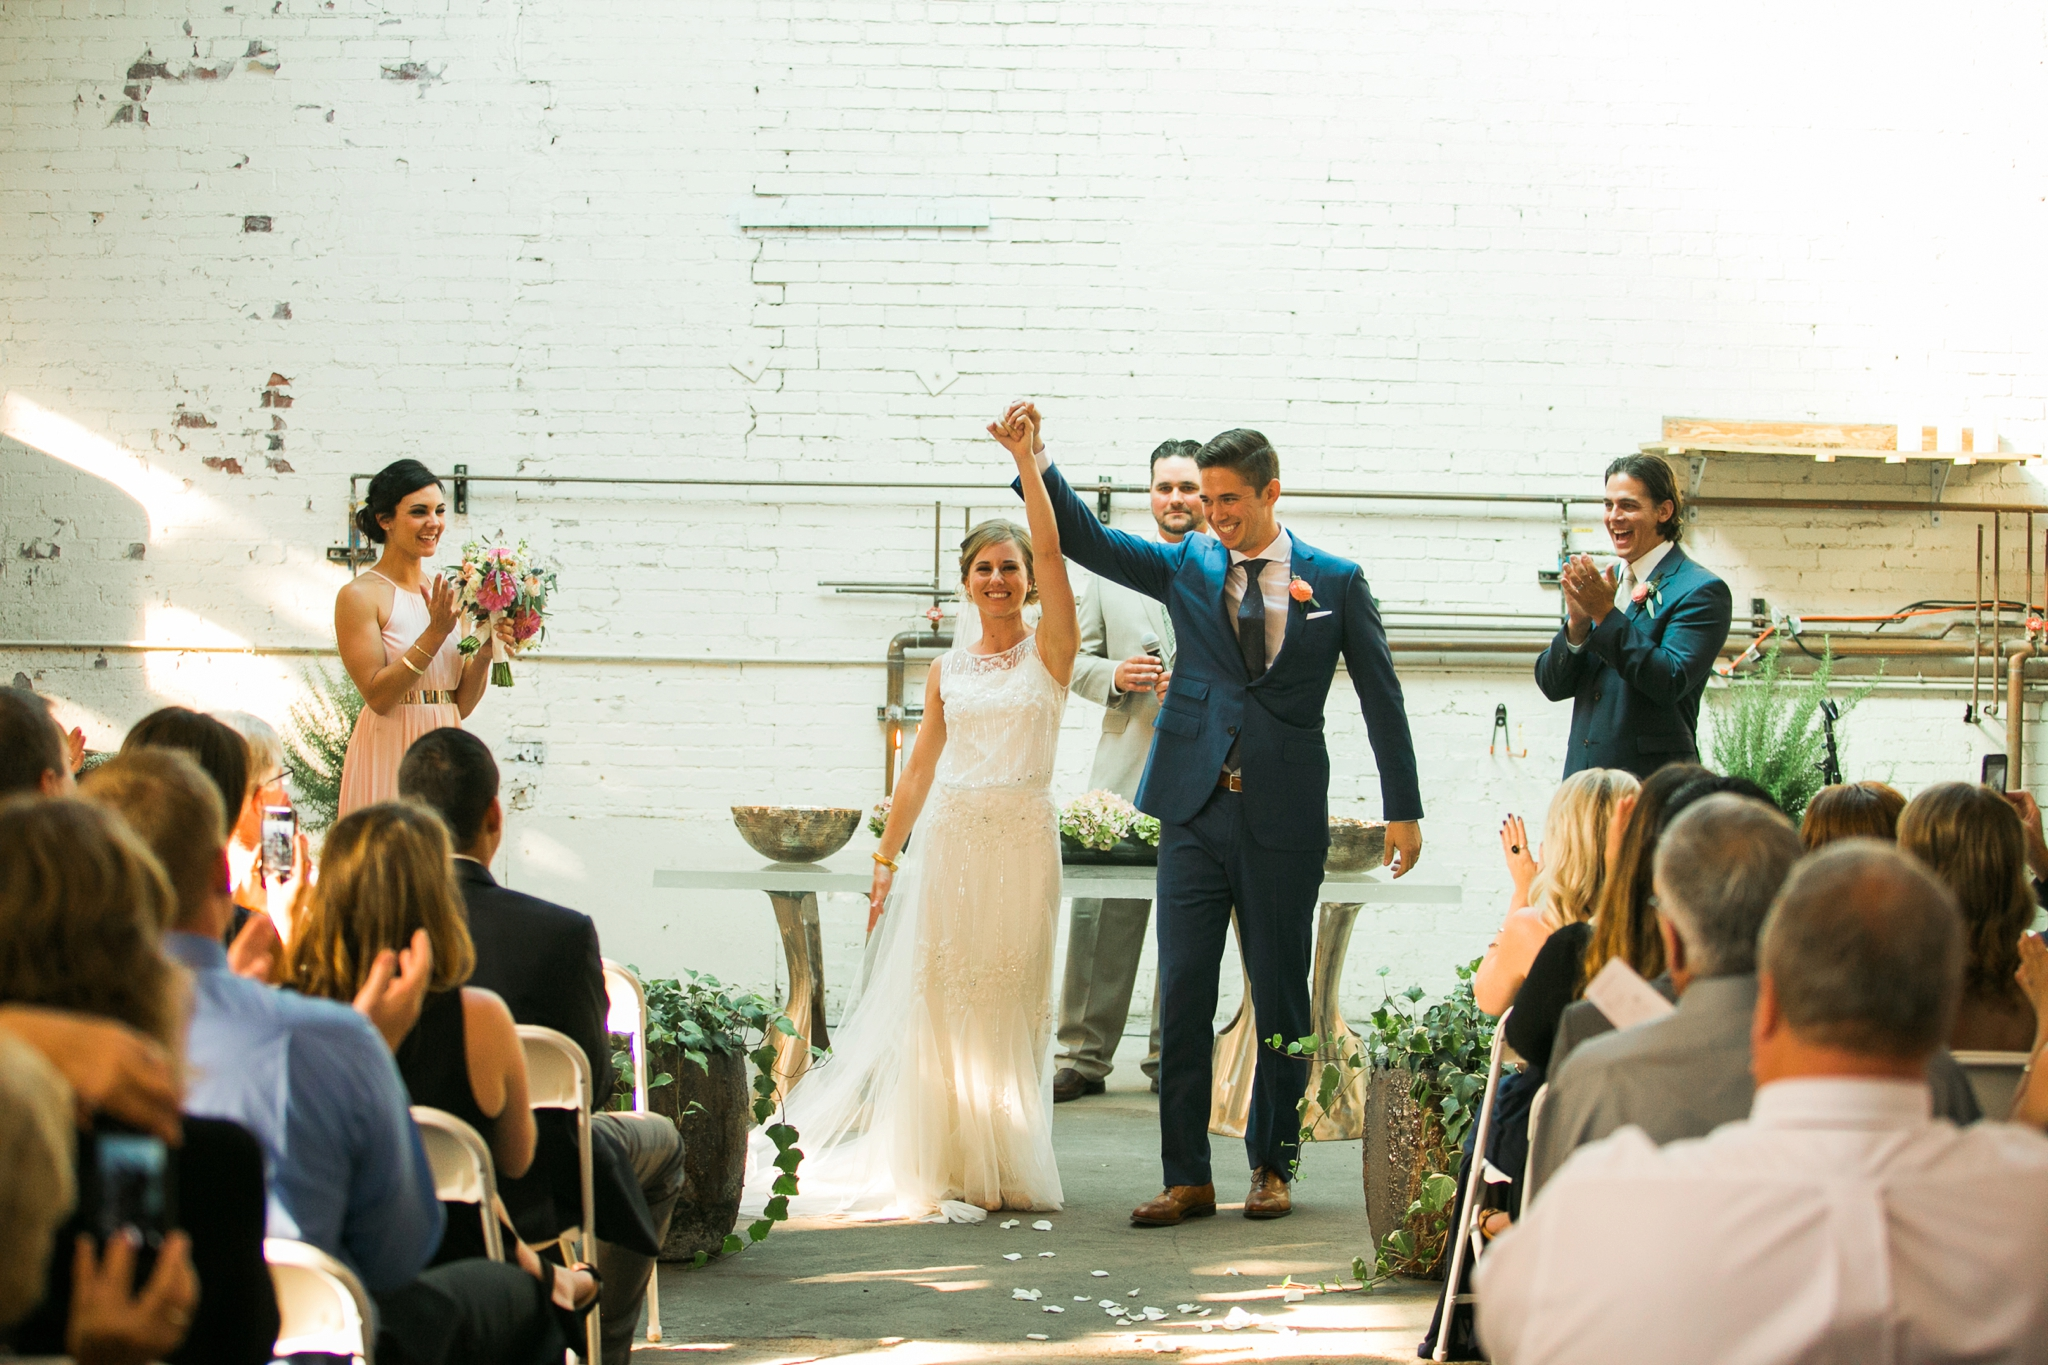 West-Supply-Foundry-Chicago-Wedding-135.jpg